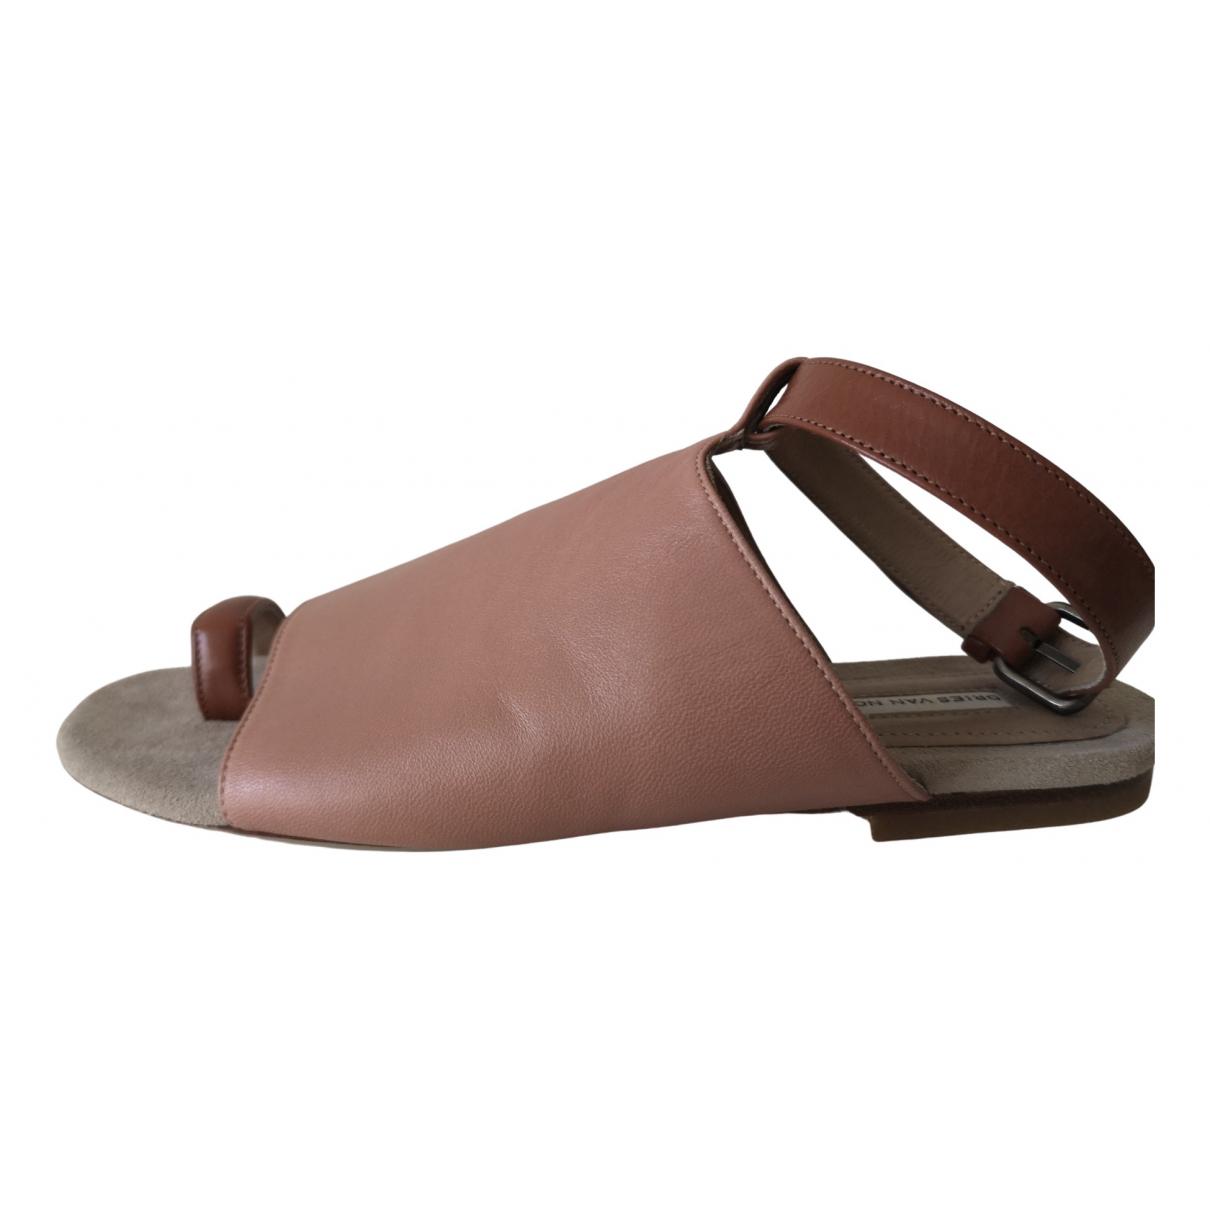 Dries Van Noten - Sandales   pour femme en cuir - beige